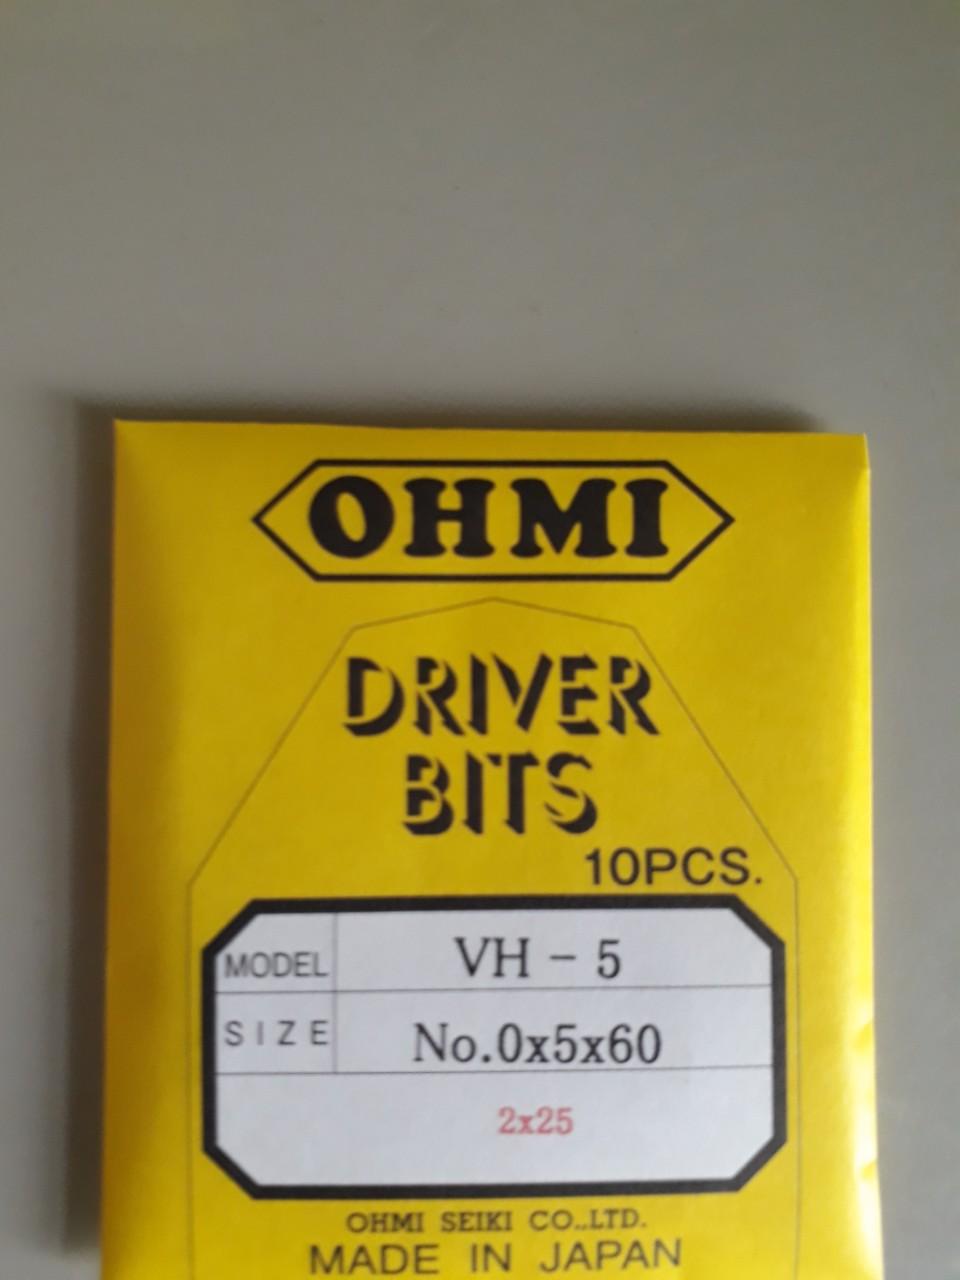 Mũi vít OHMI VH-5